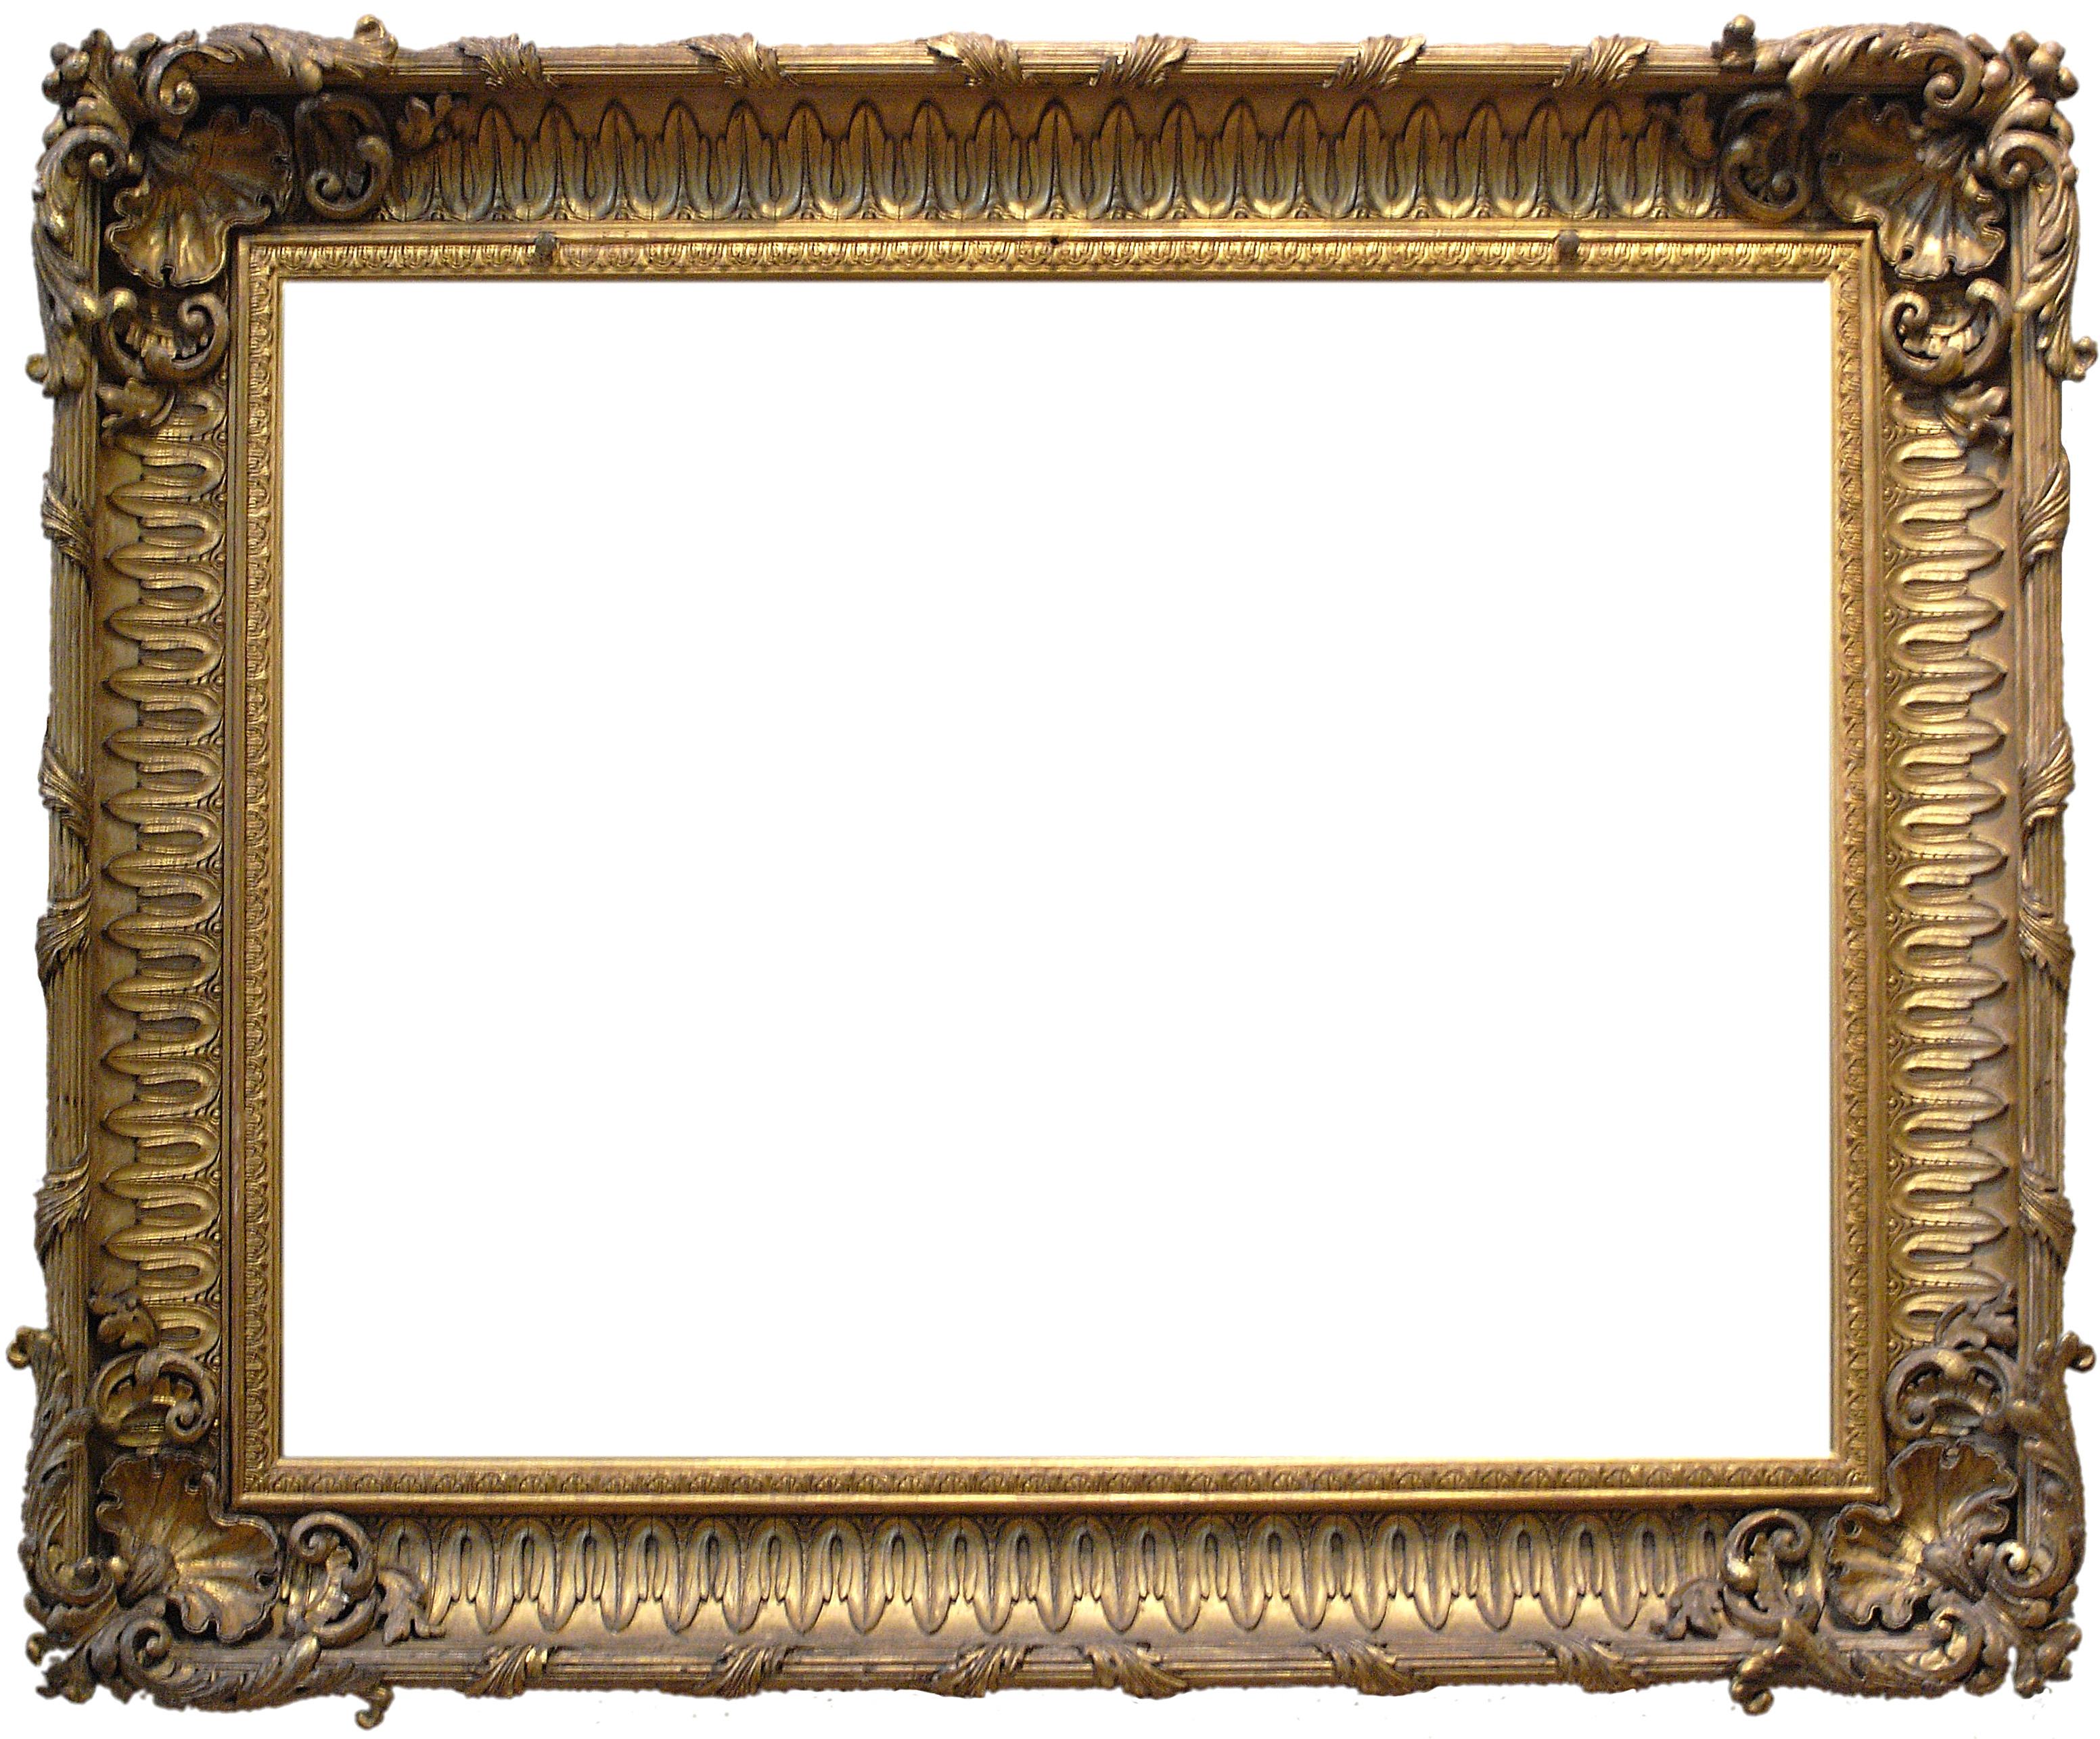 Frame 16 - Ornate Gold | Flickr - Photo Sharing!